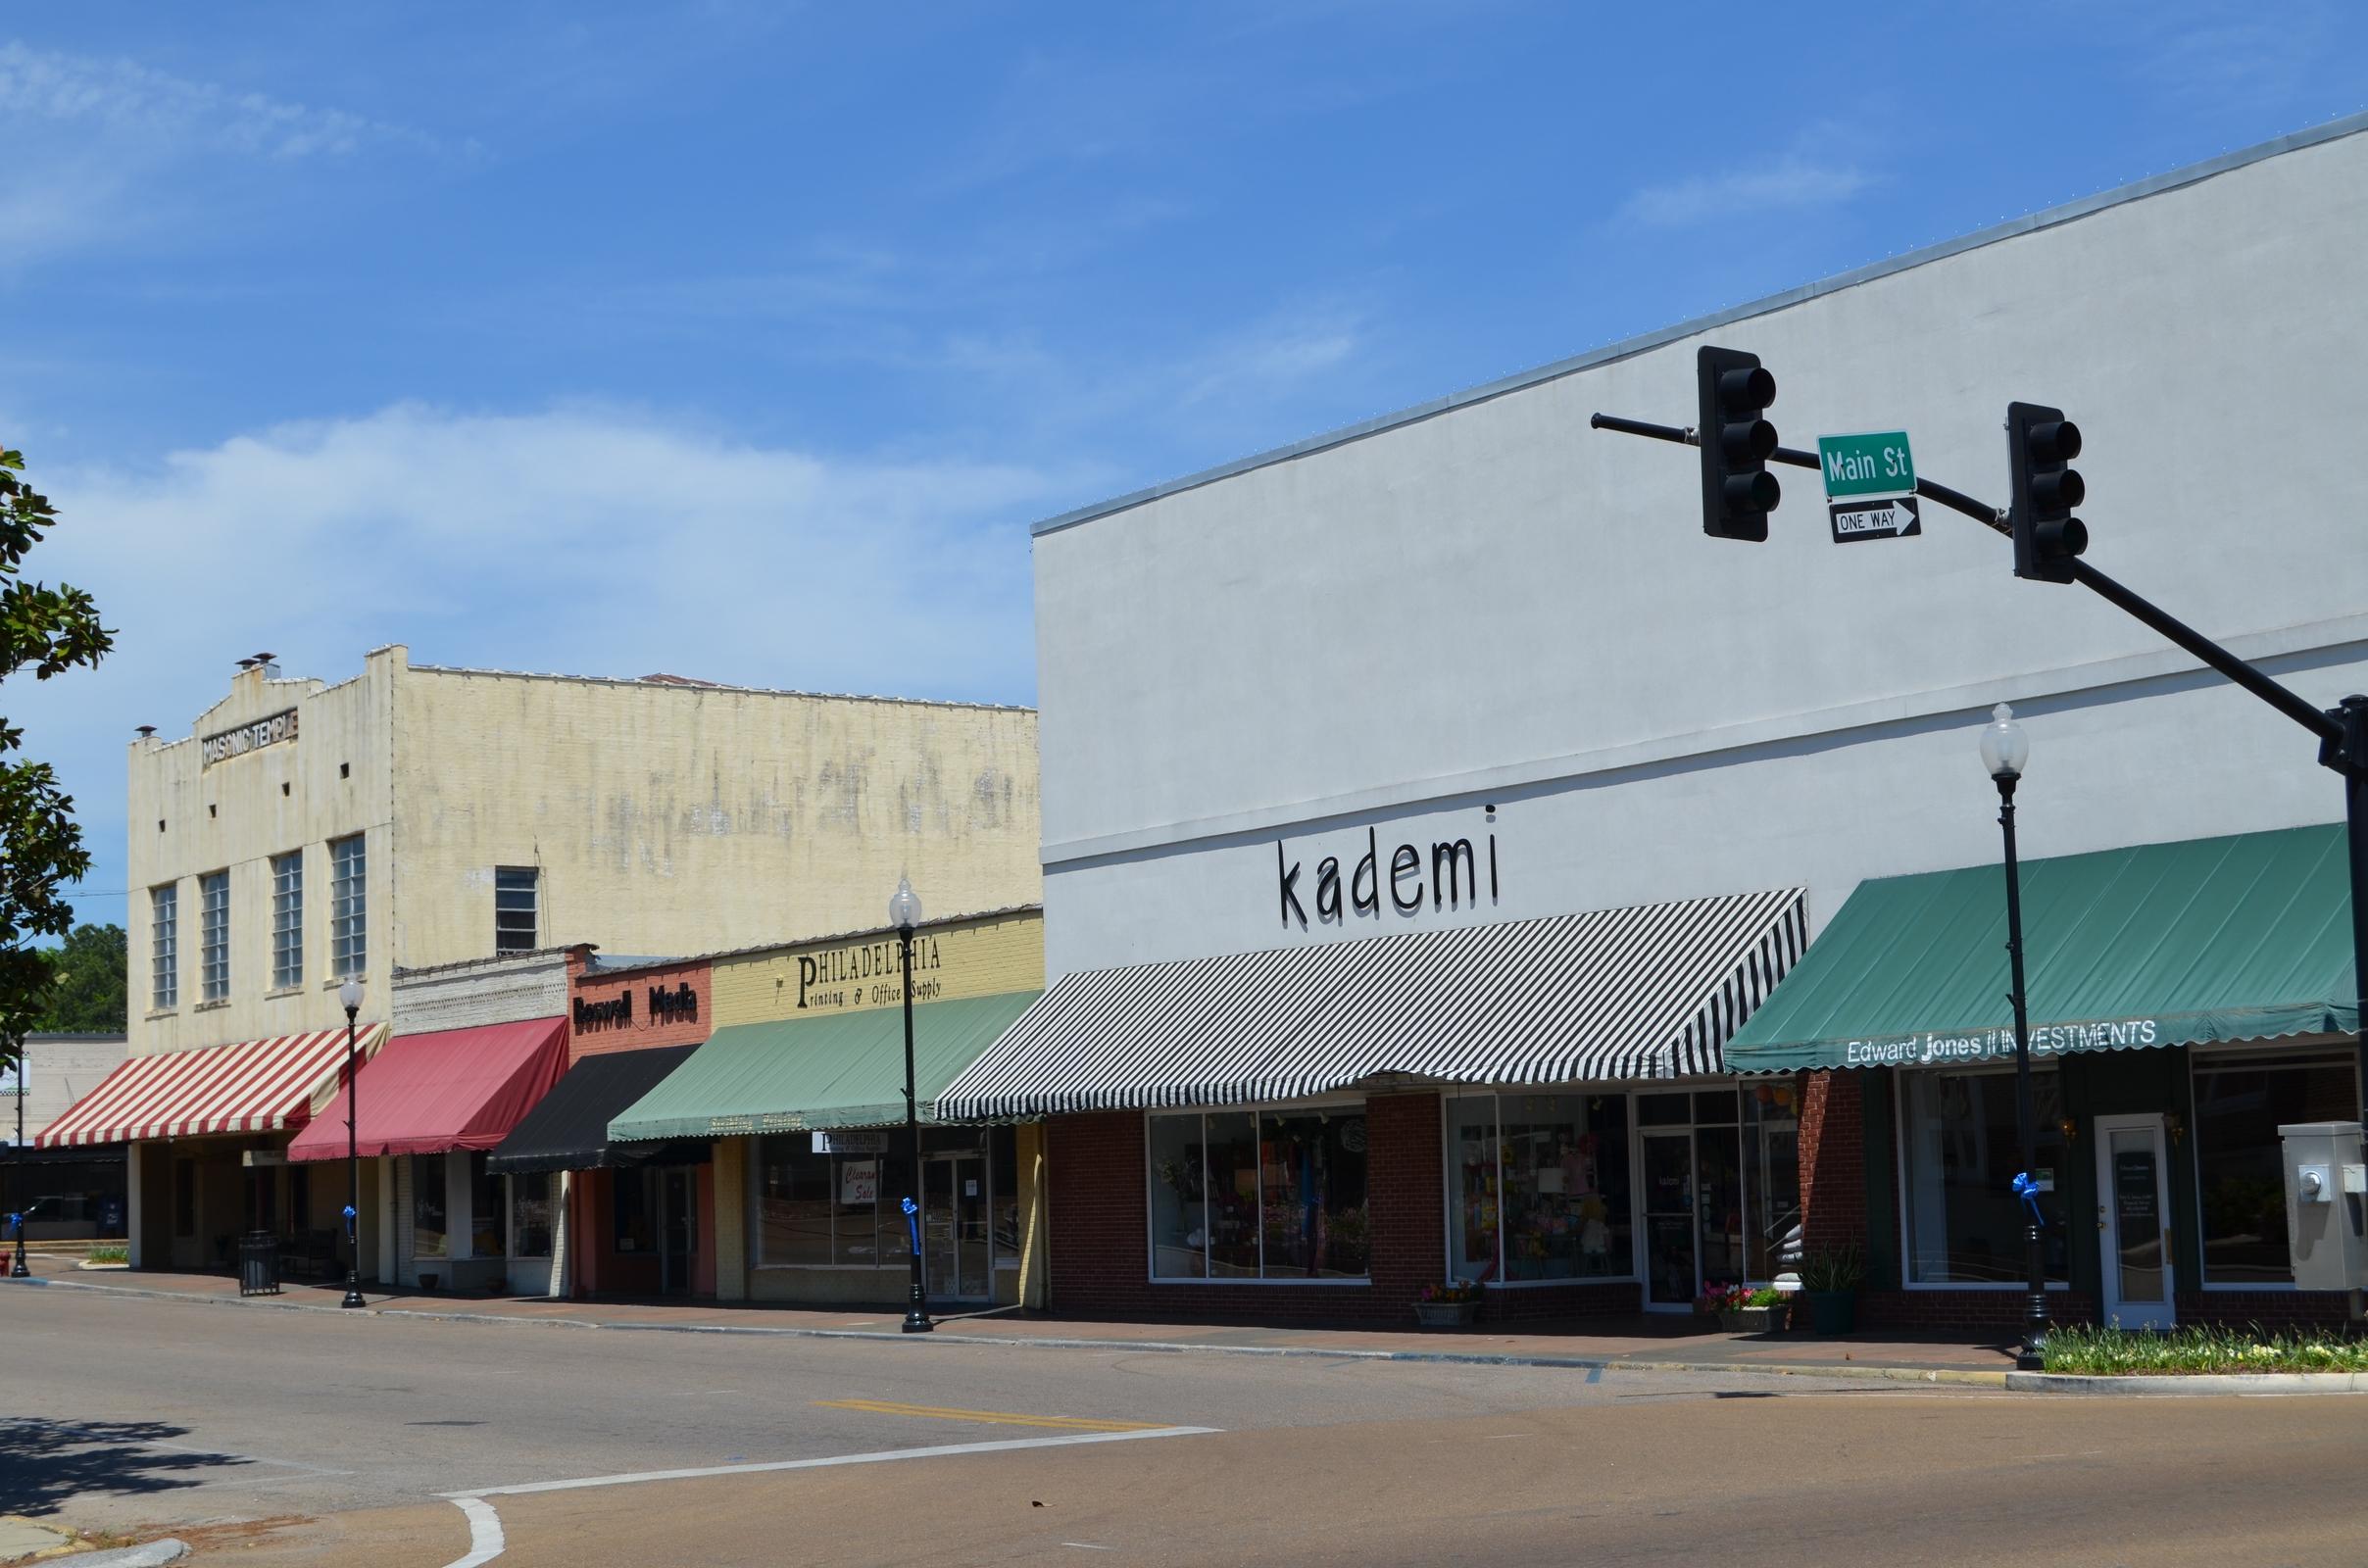 Pearl City Satalite City Hall